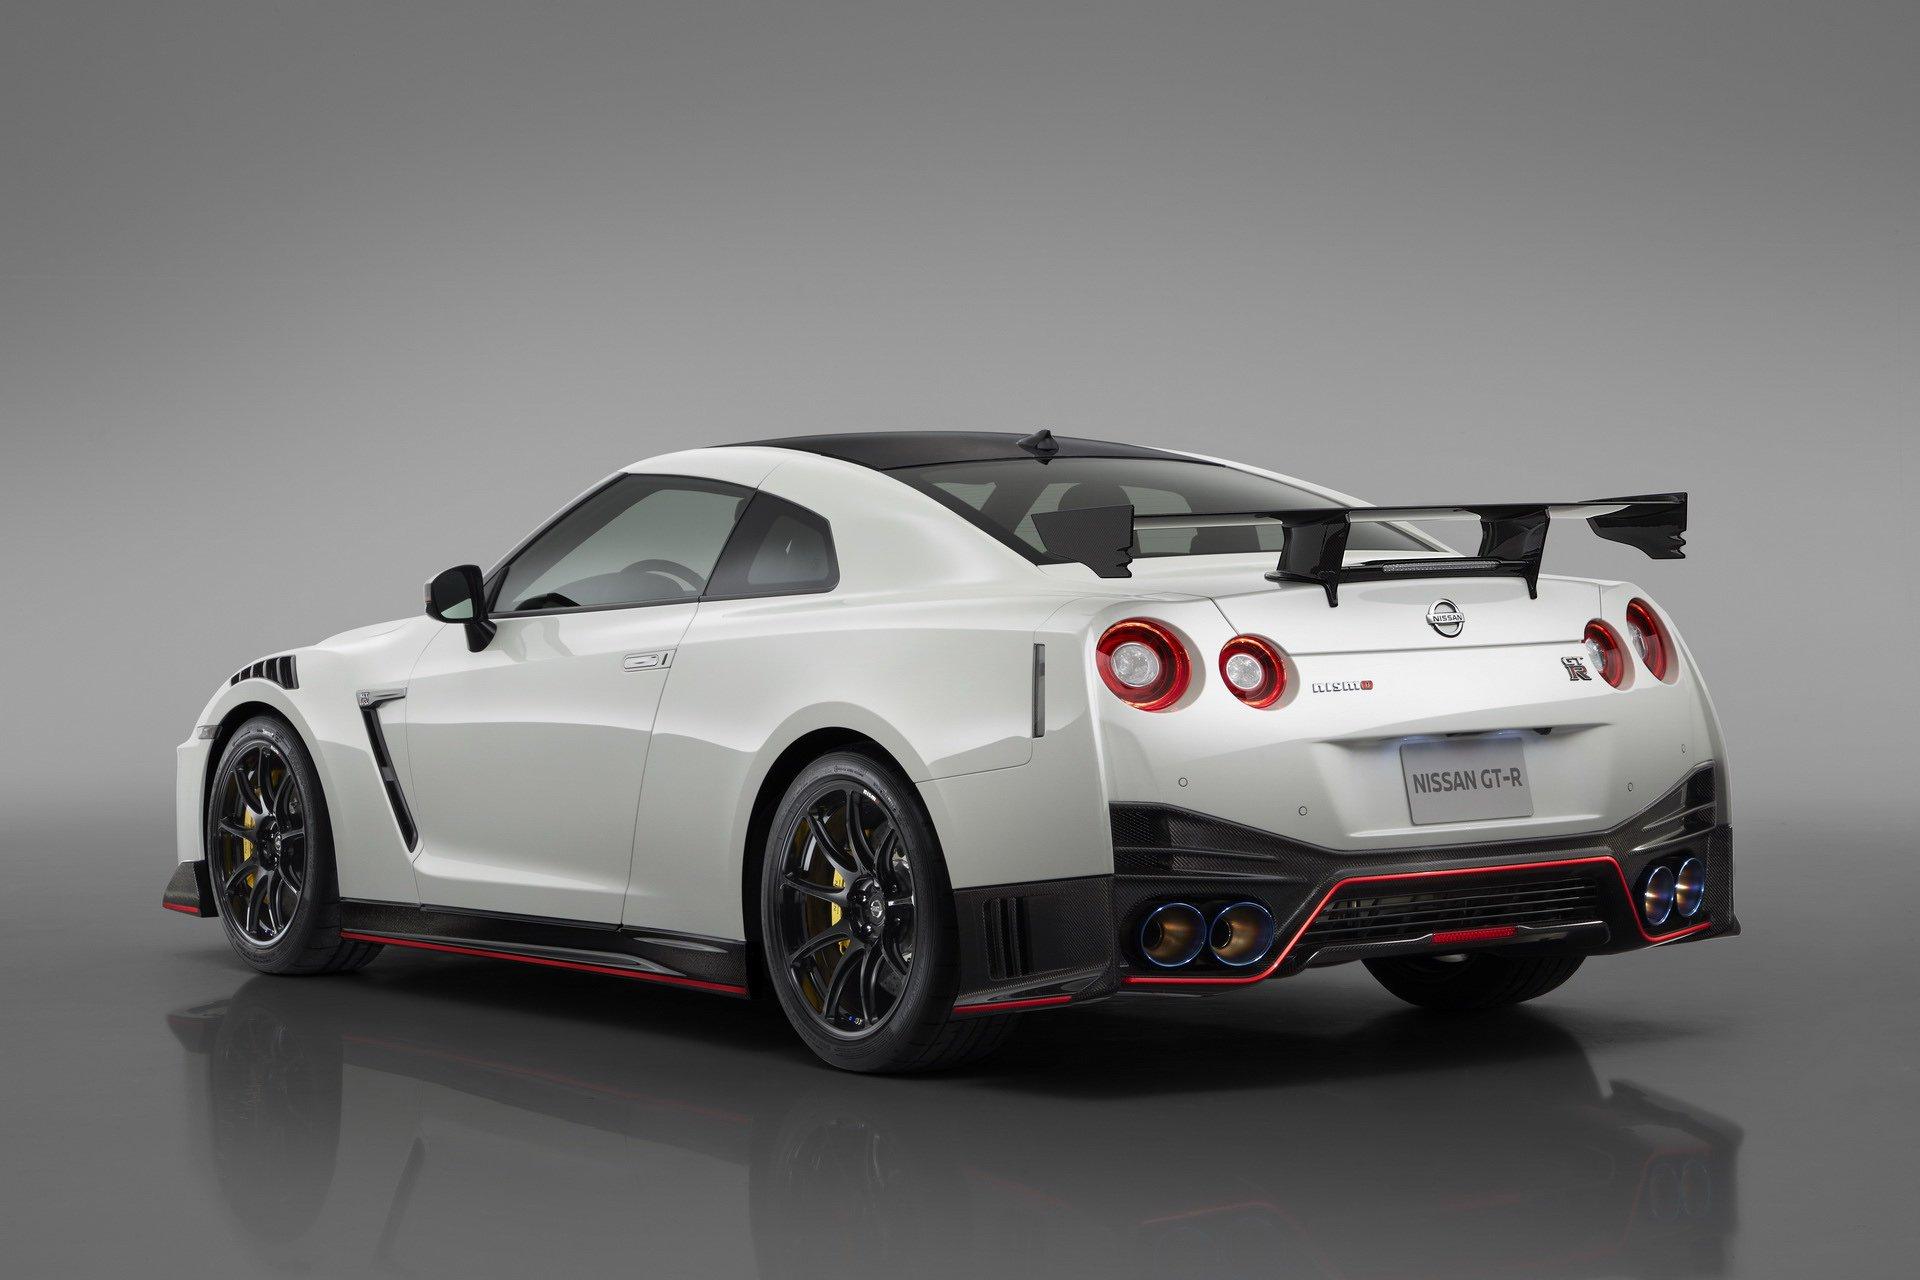 Nissan-GT-R-Nismo-2020-16